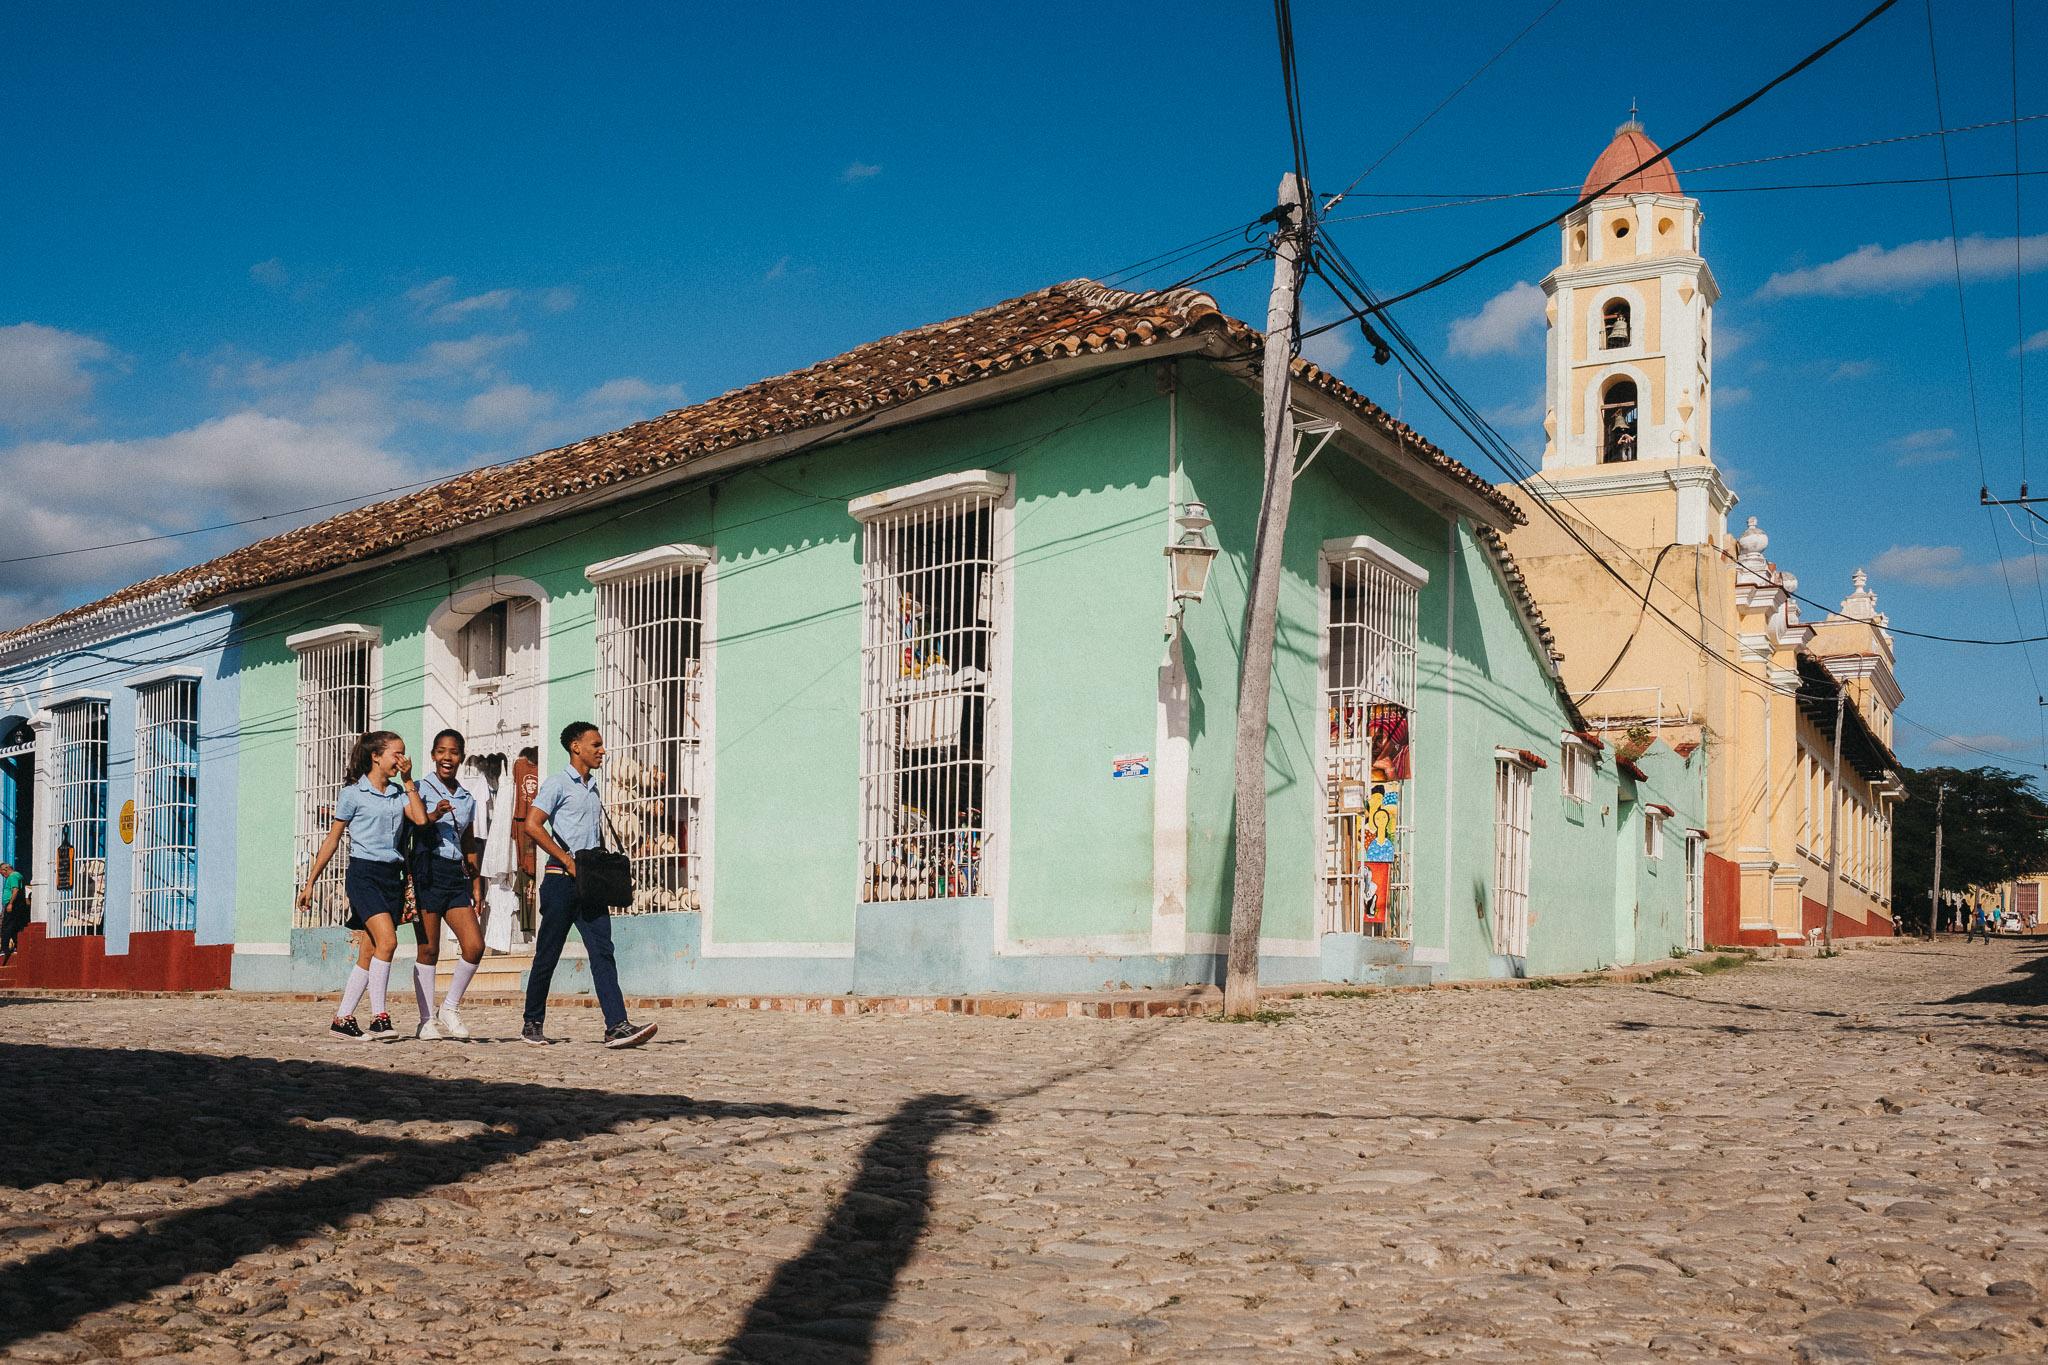 Cuba-2017-12-Trinidad-0146.jpg